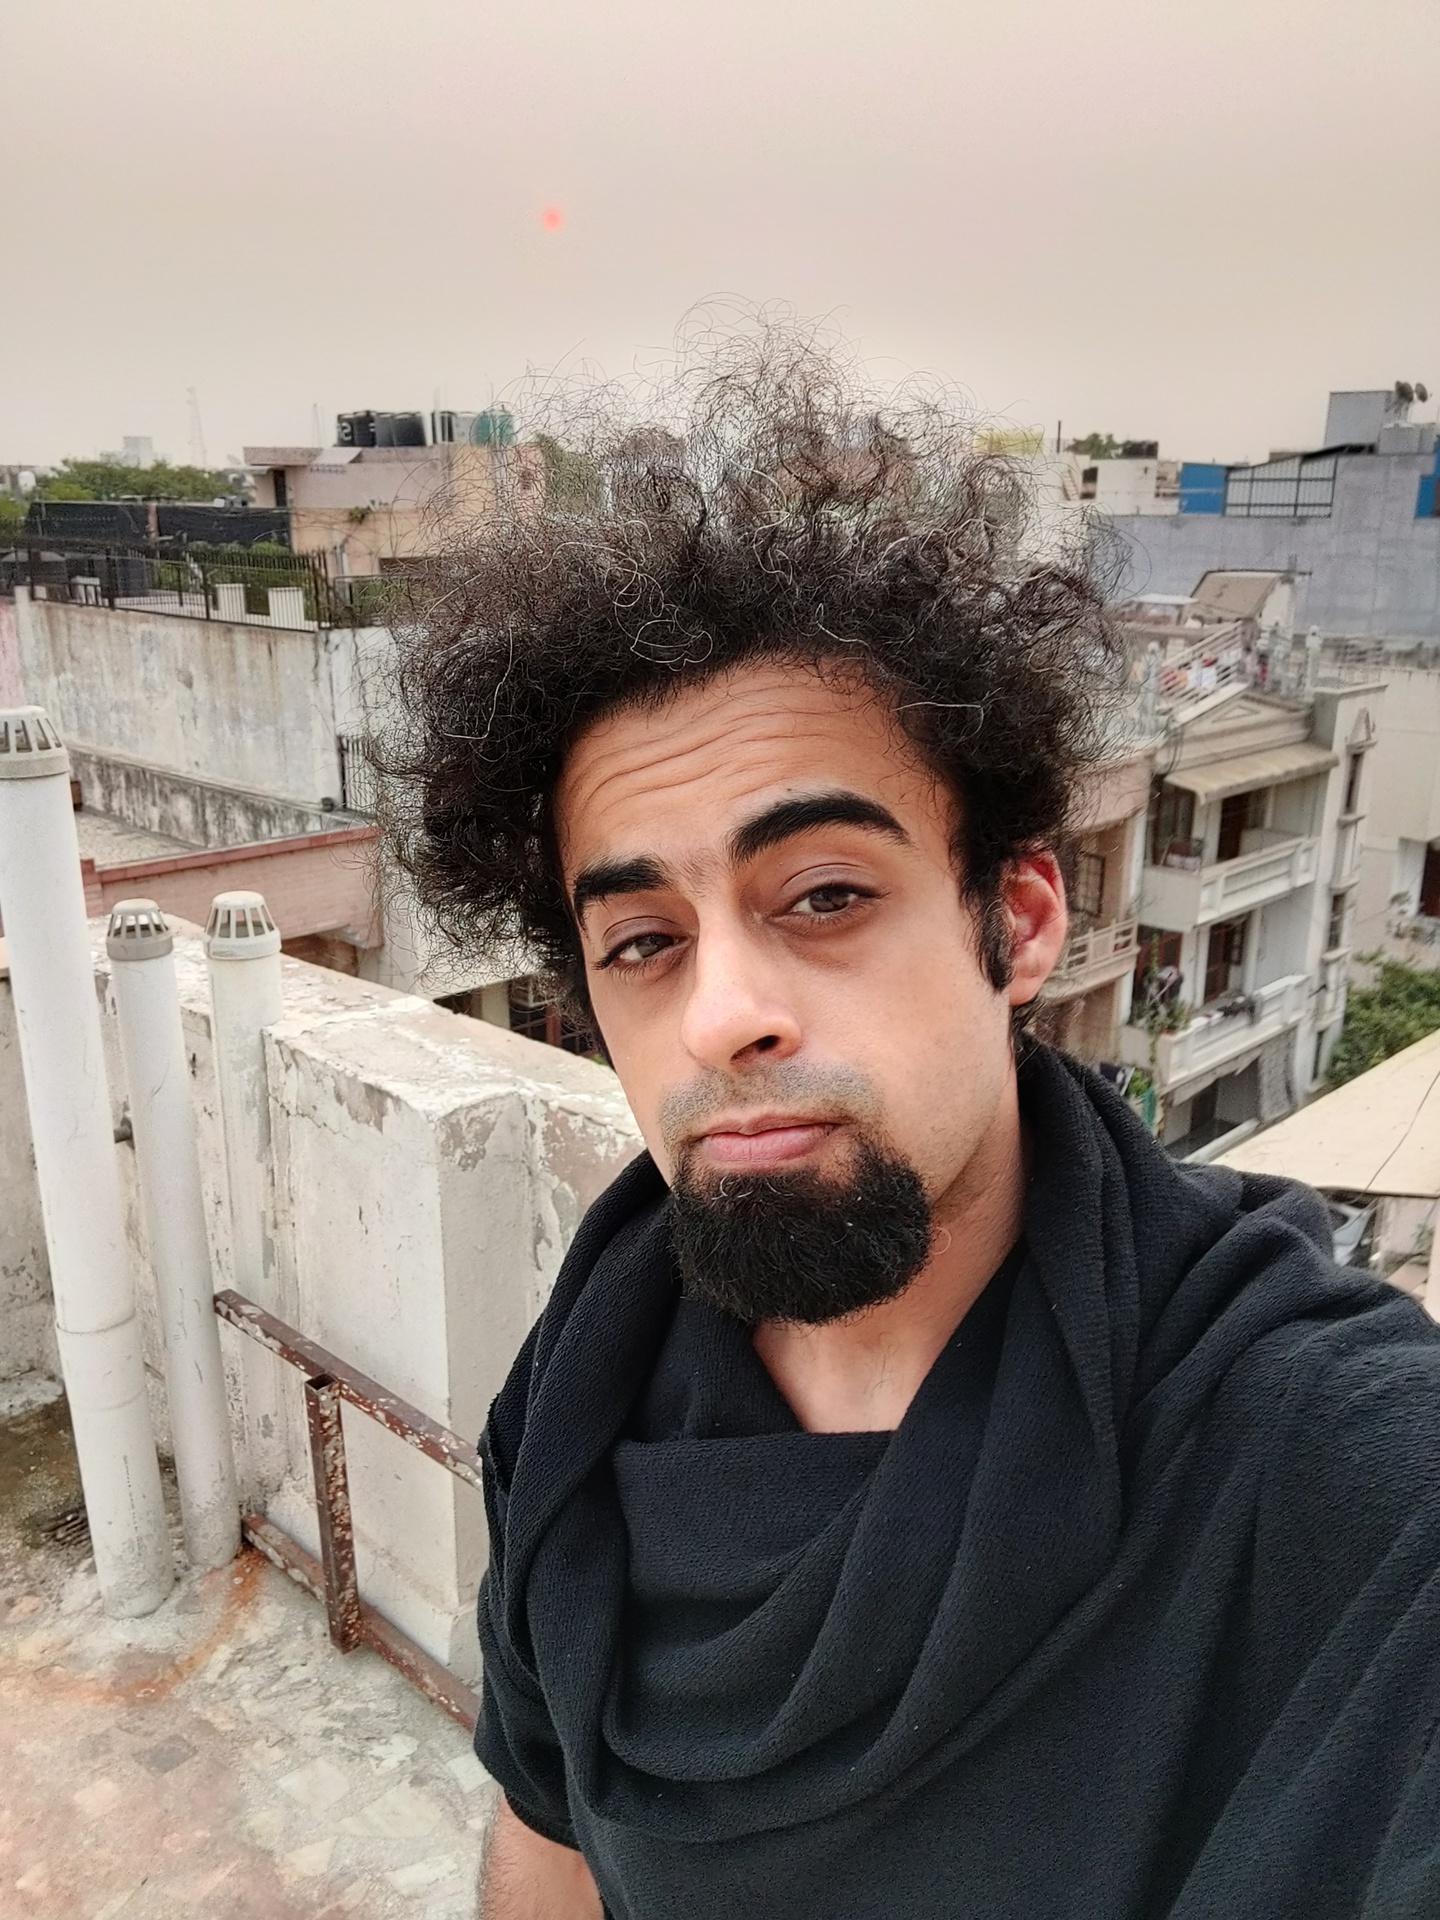 OnePlus 8 selfie